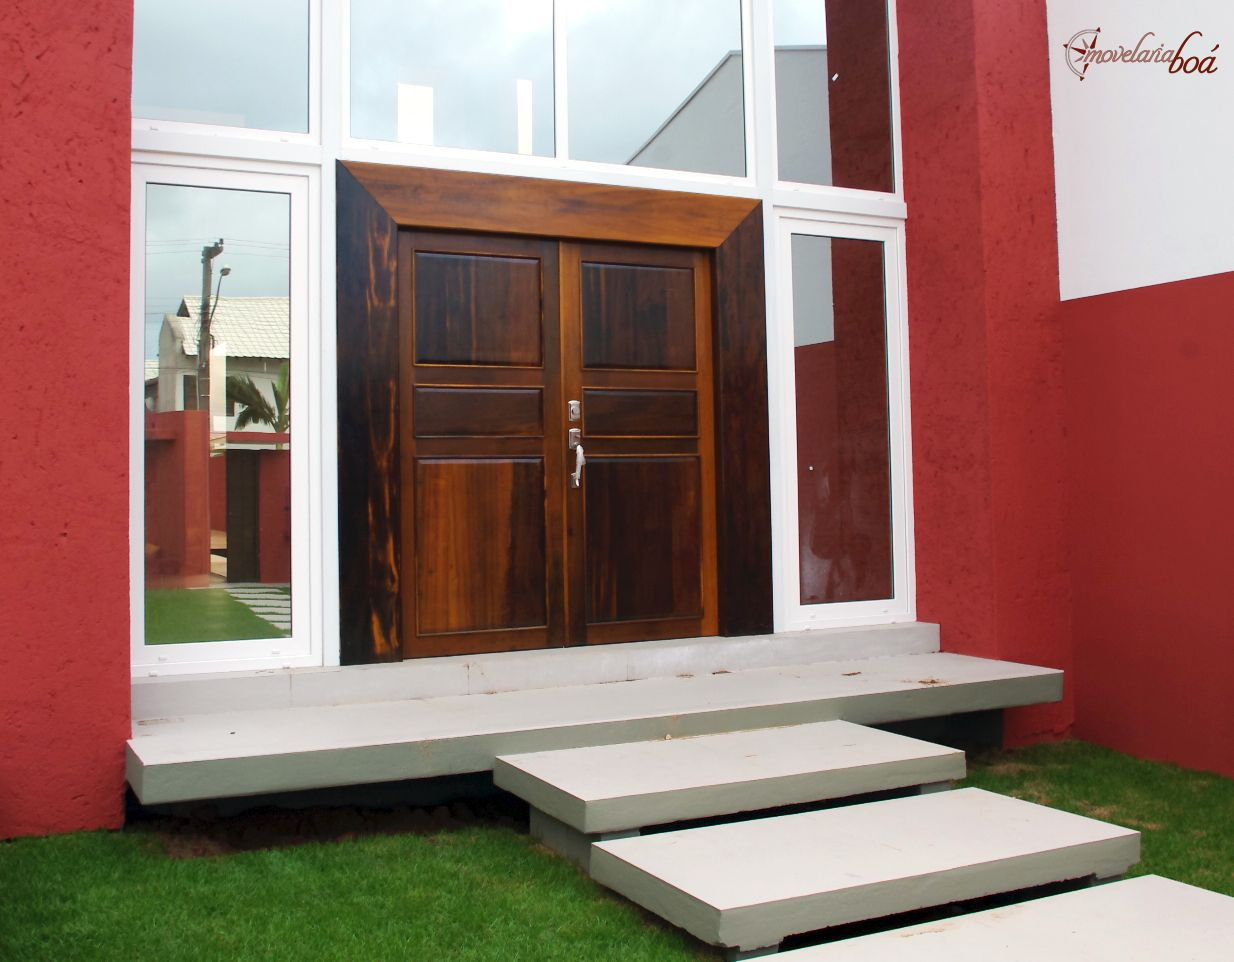 Porta 2,5 x 2,5 m em madeira maciça (imbuia). #door #wood #home #house #porta #movelaria boá